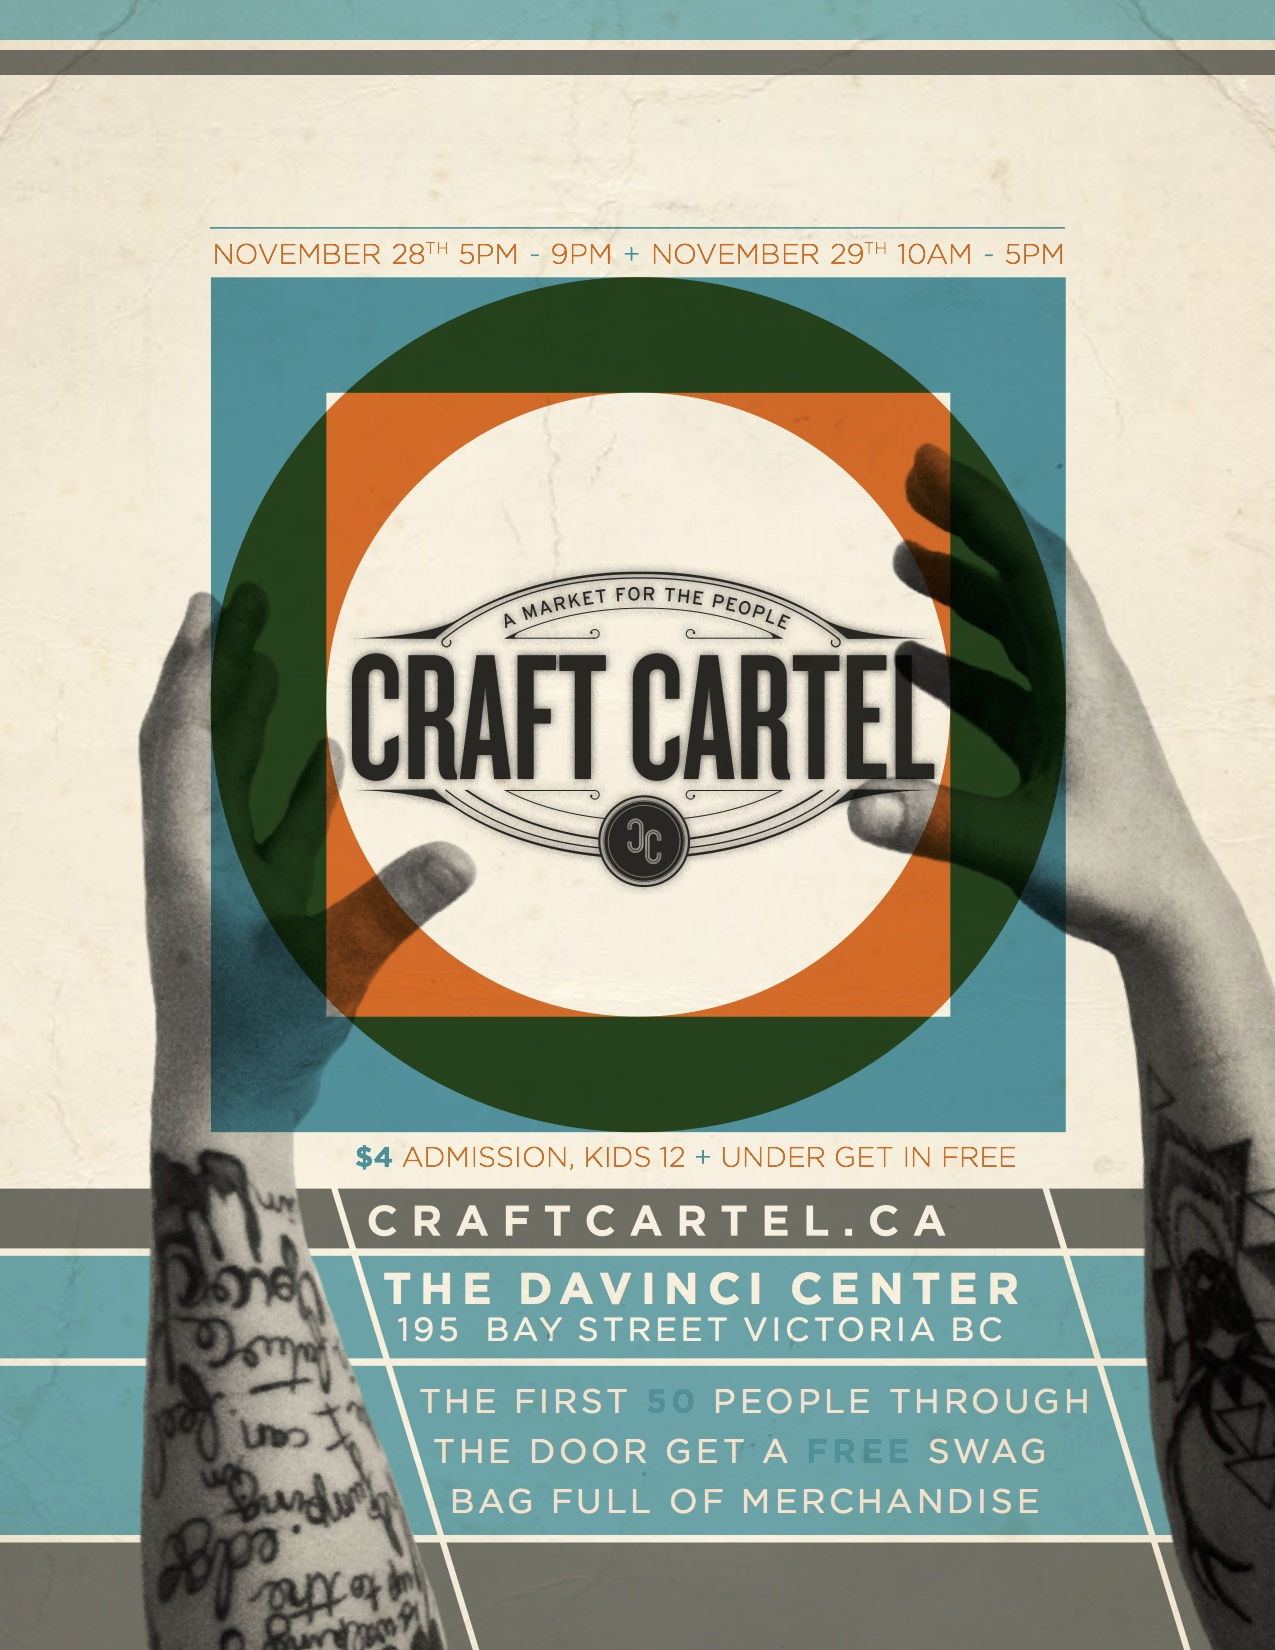 CrafteCartel-2014-poster.jpg